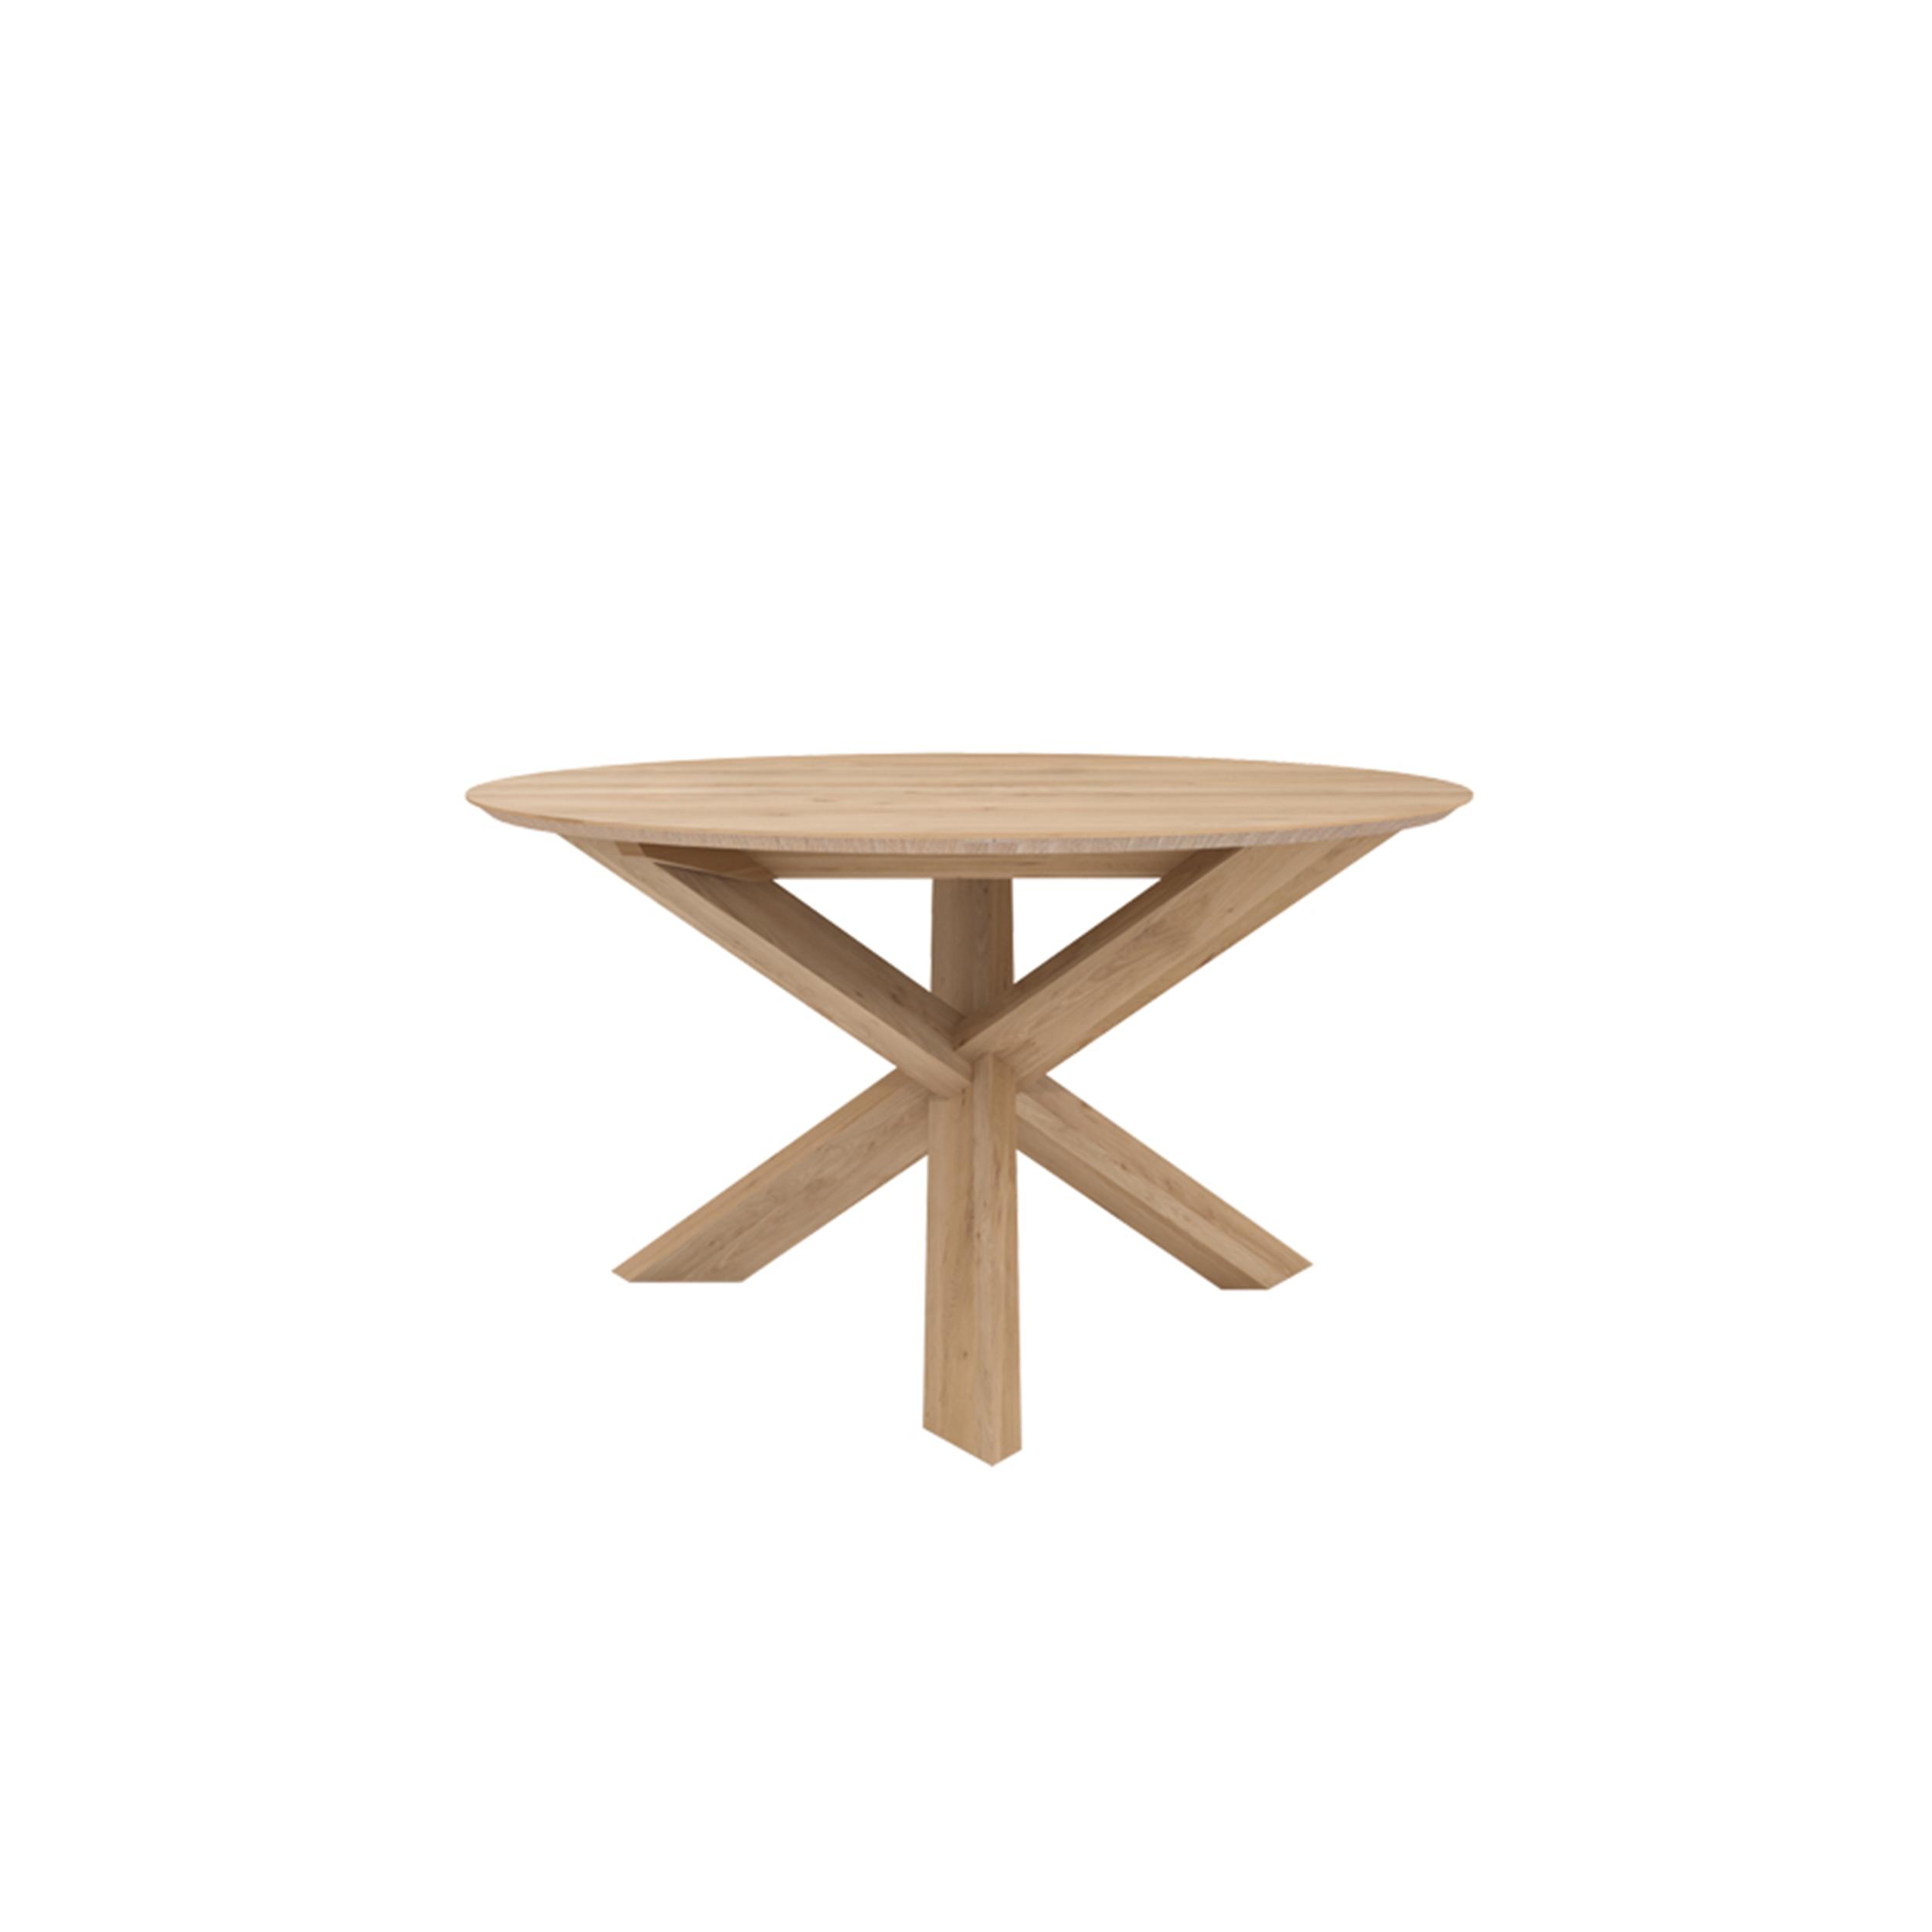 TGE-050165-Oak-Circle-dining-table-136x136x76.jpg.png